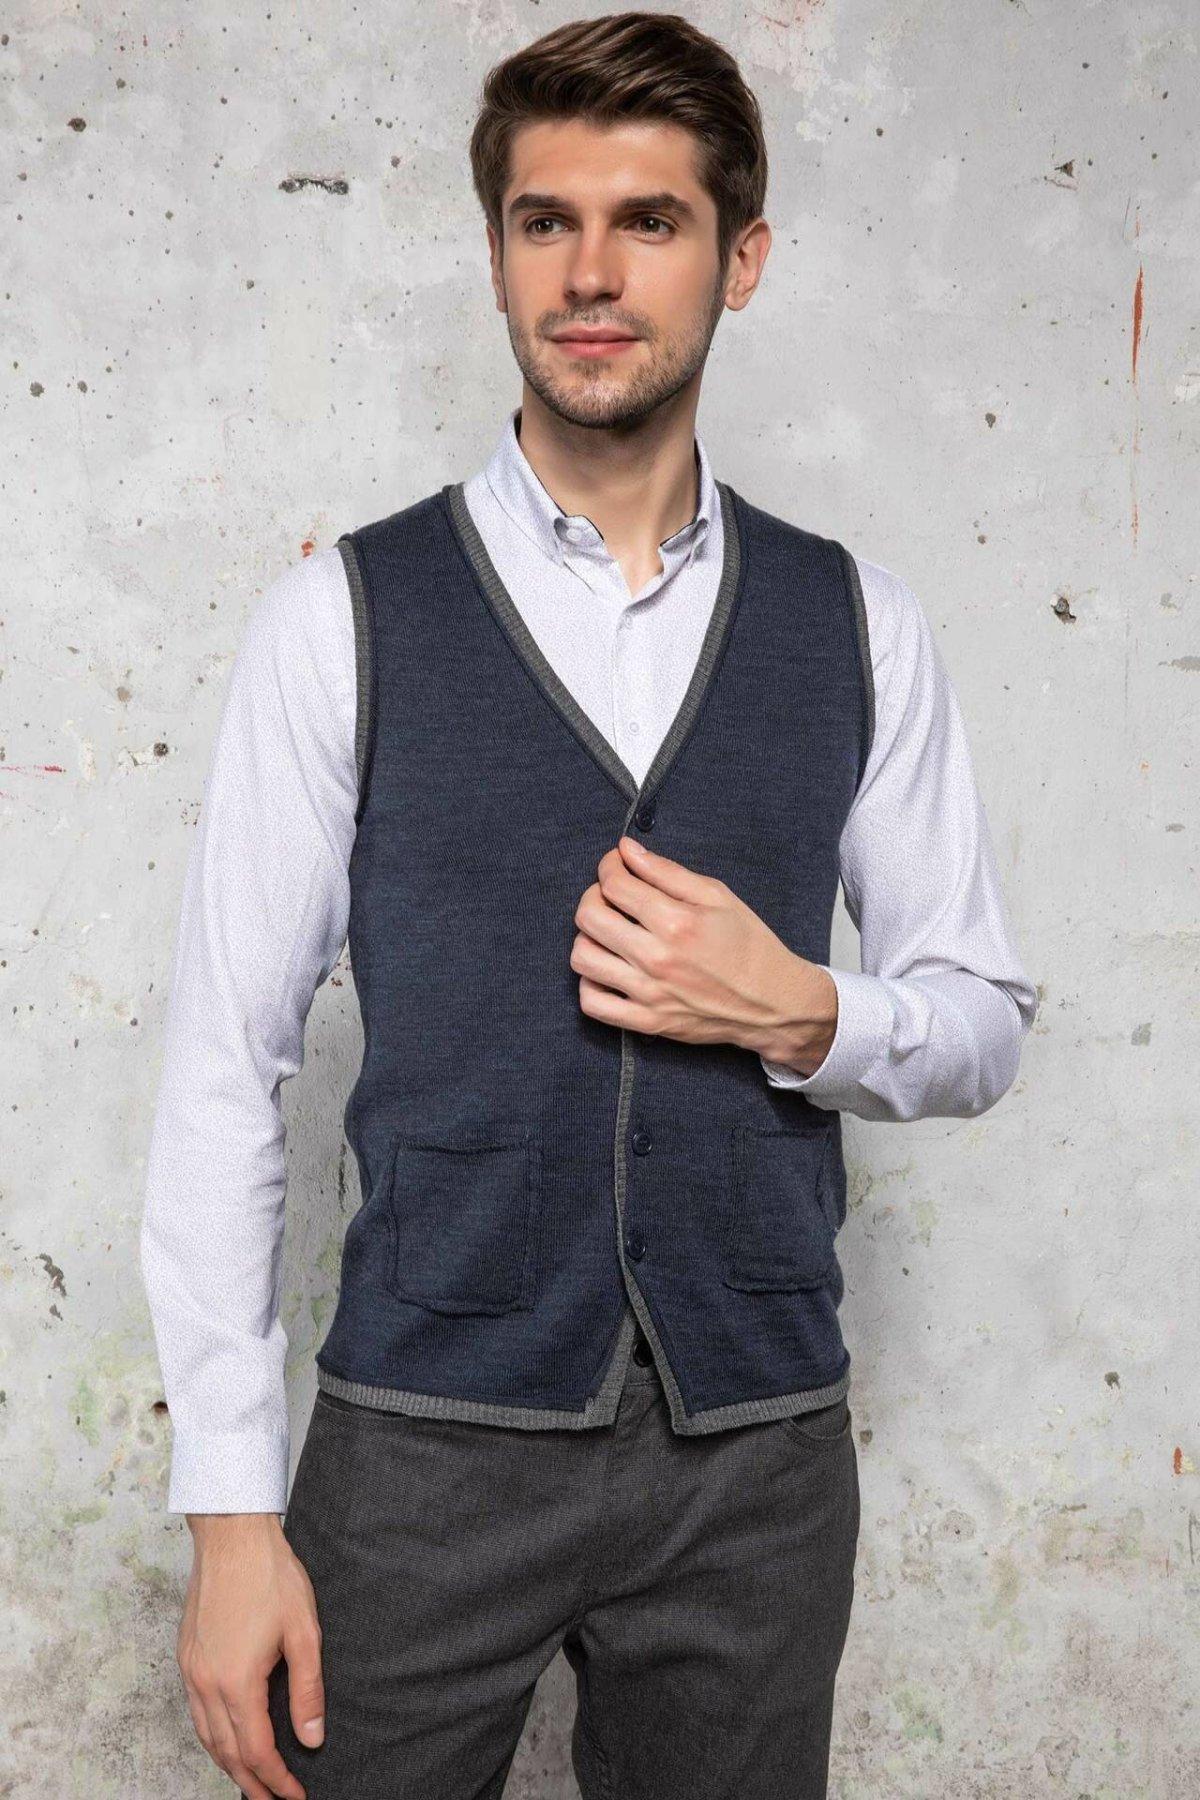 DeFacto Casual V-neck Knitted Man Vest Single-breasted Slim Sleeveless Garment Male Leisure Fashion Autumn - J4683AZ18WN